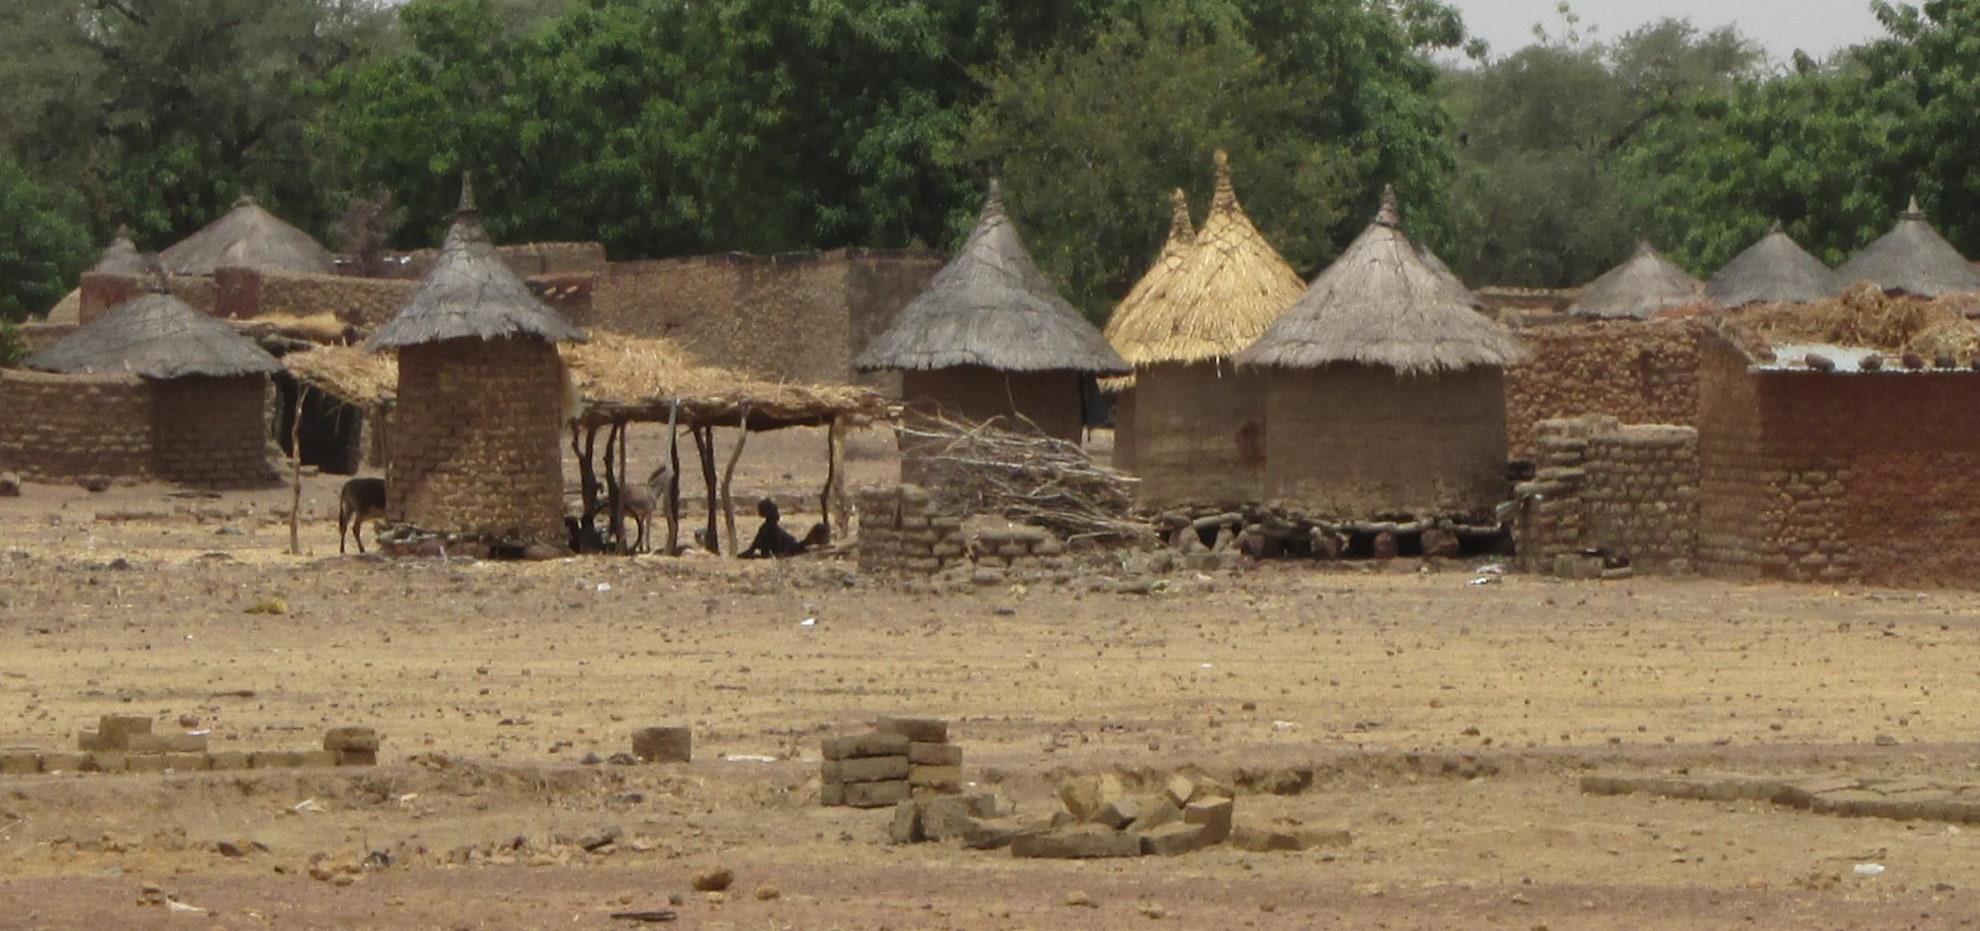 A village in sub-Saharan Africa